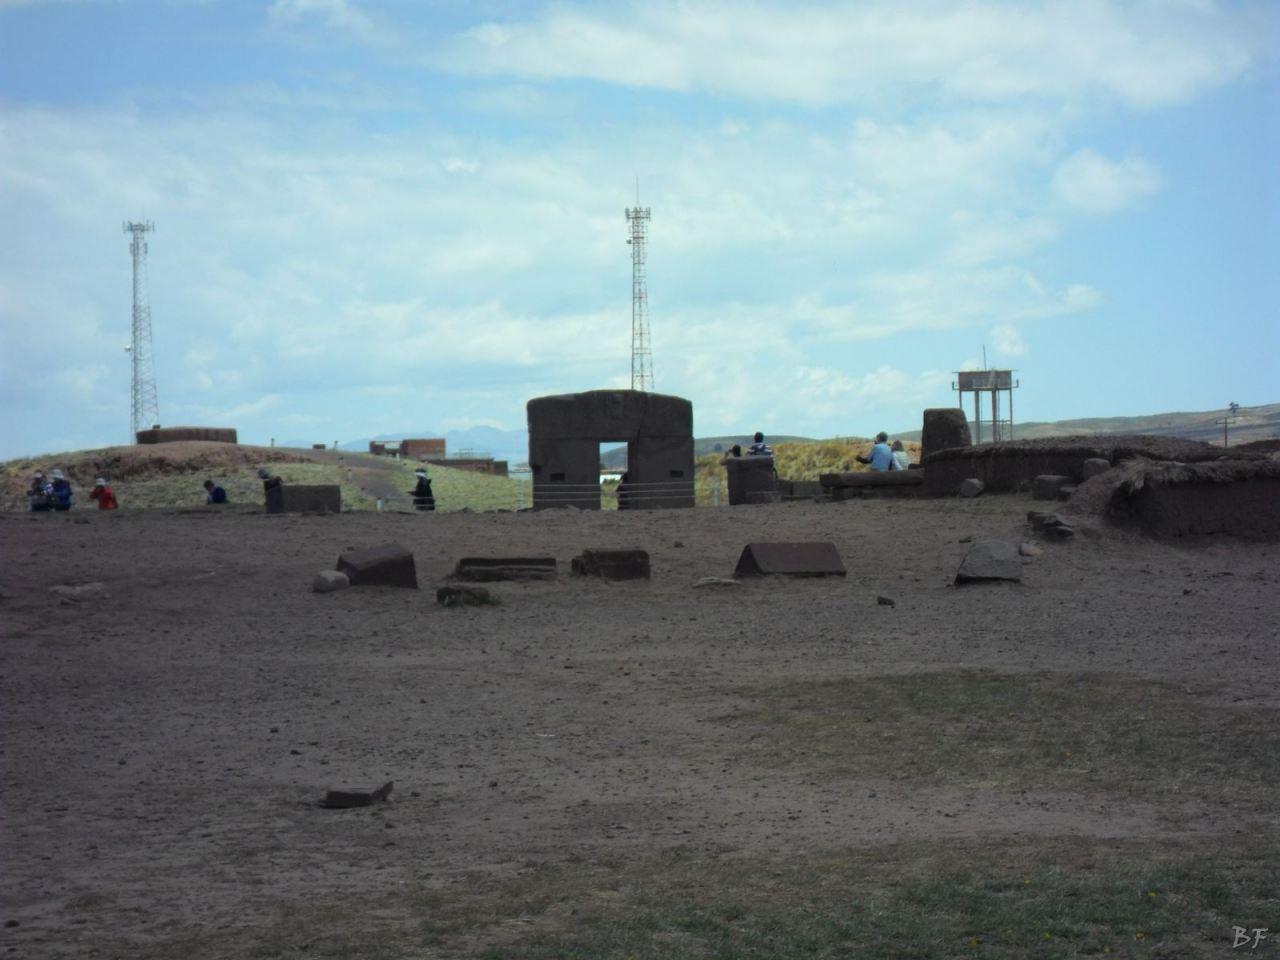 Sito-Megalitico-Piramide-Akapana-Kalasasaya-Menhir-Tiahuanaco-Bolivia-34